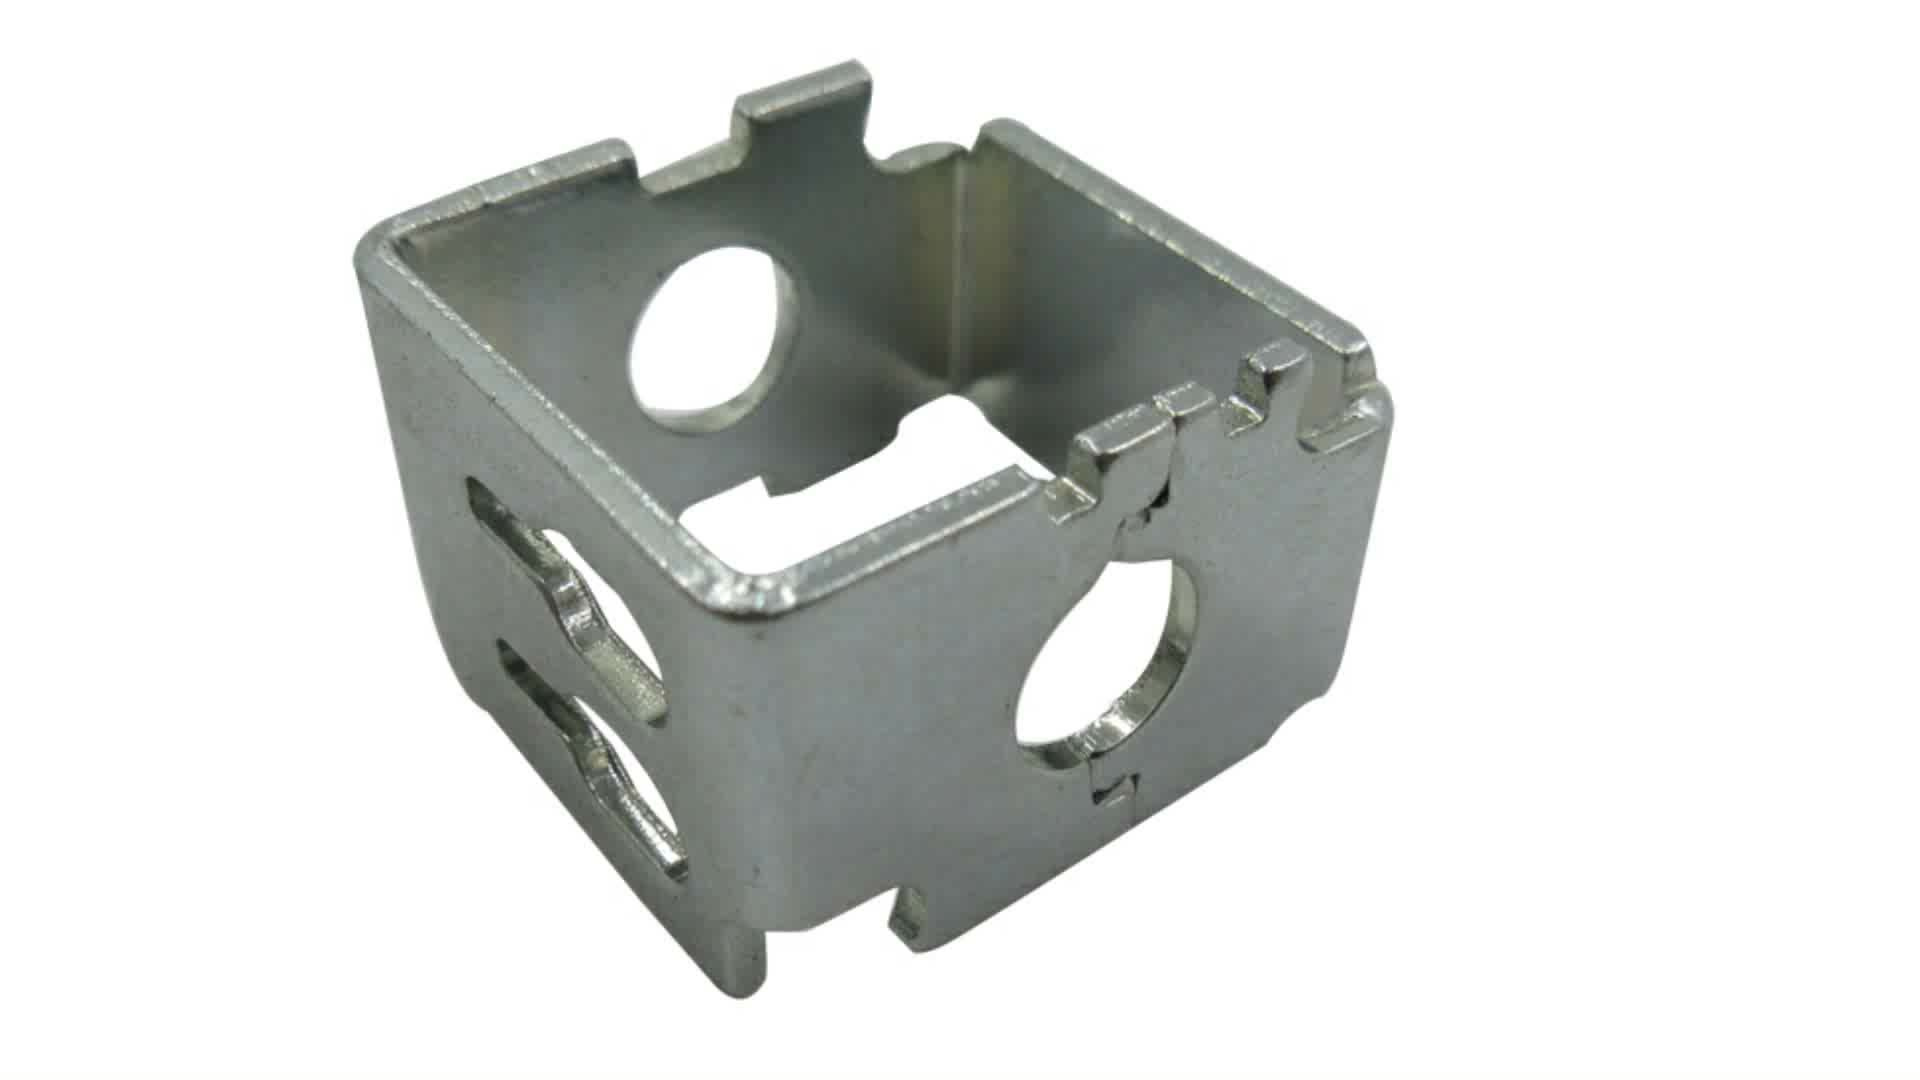 OEM metal box fabrication, sheet metal box processing with progressive die